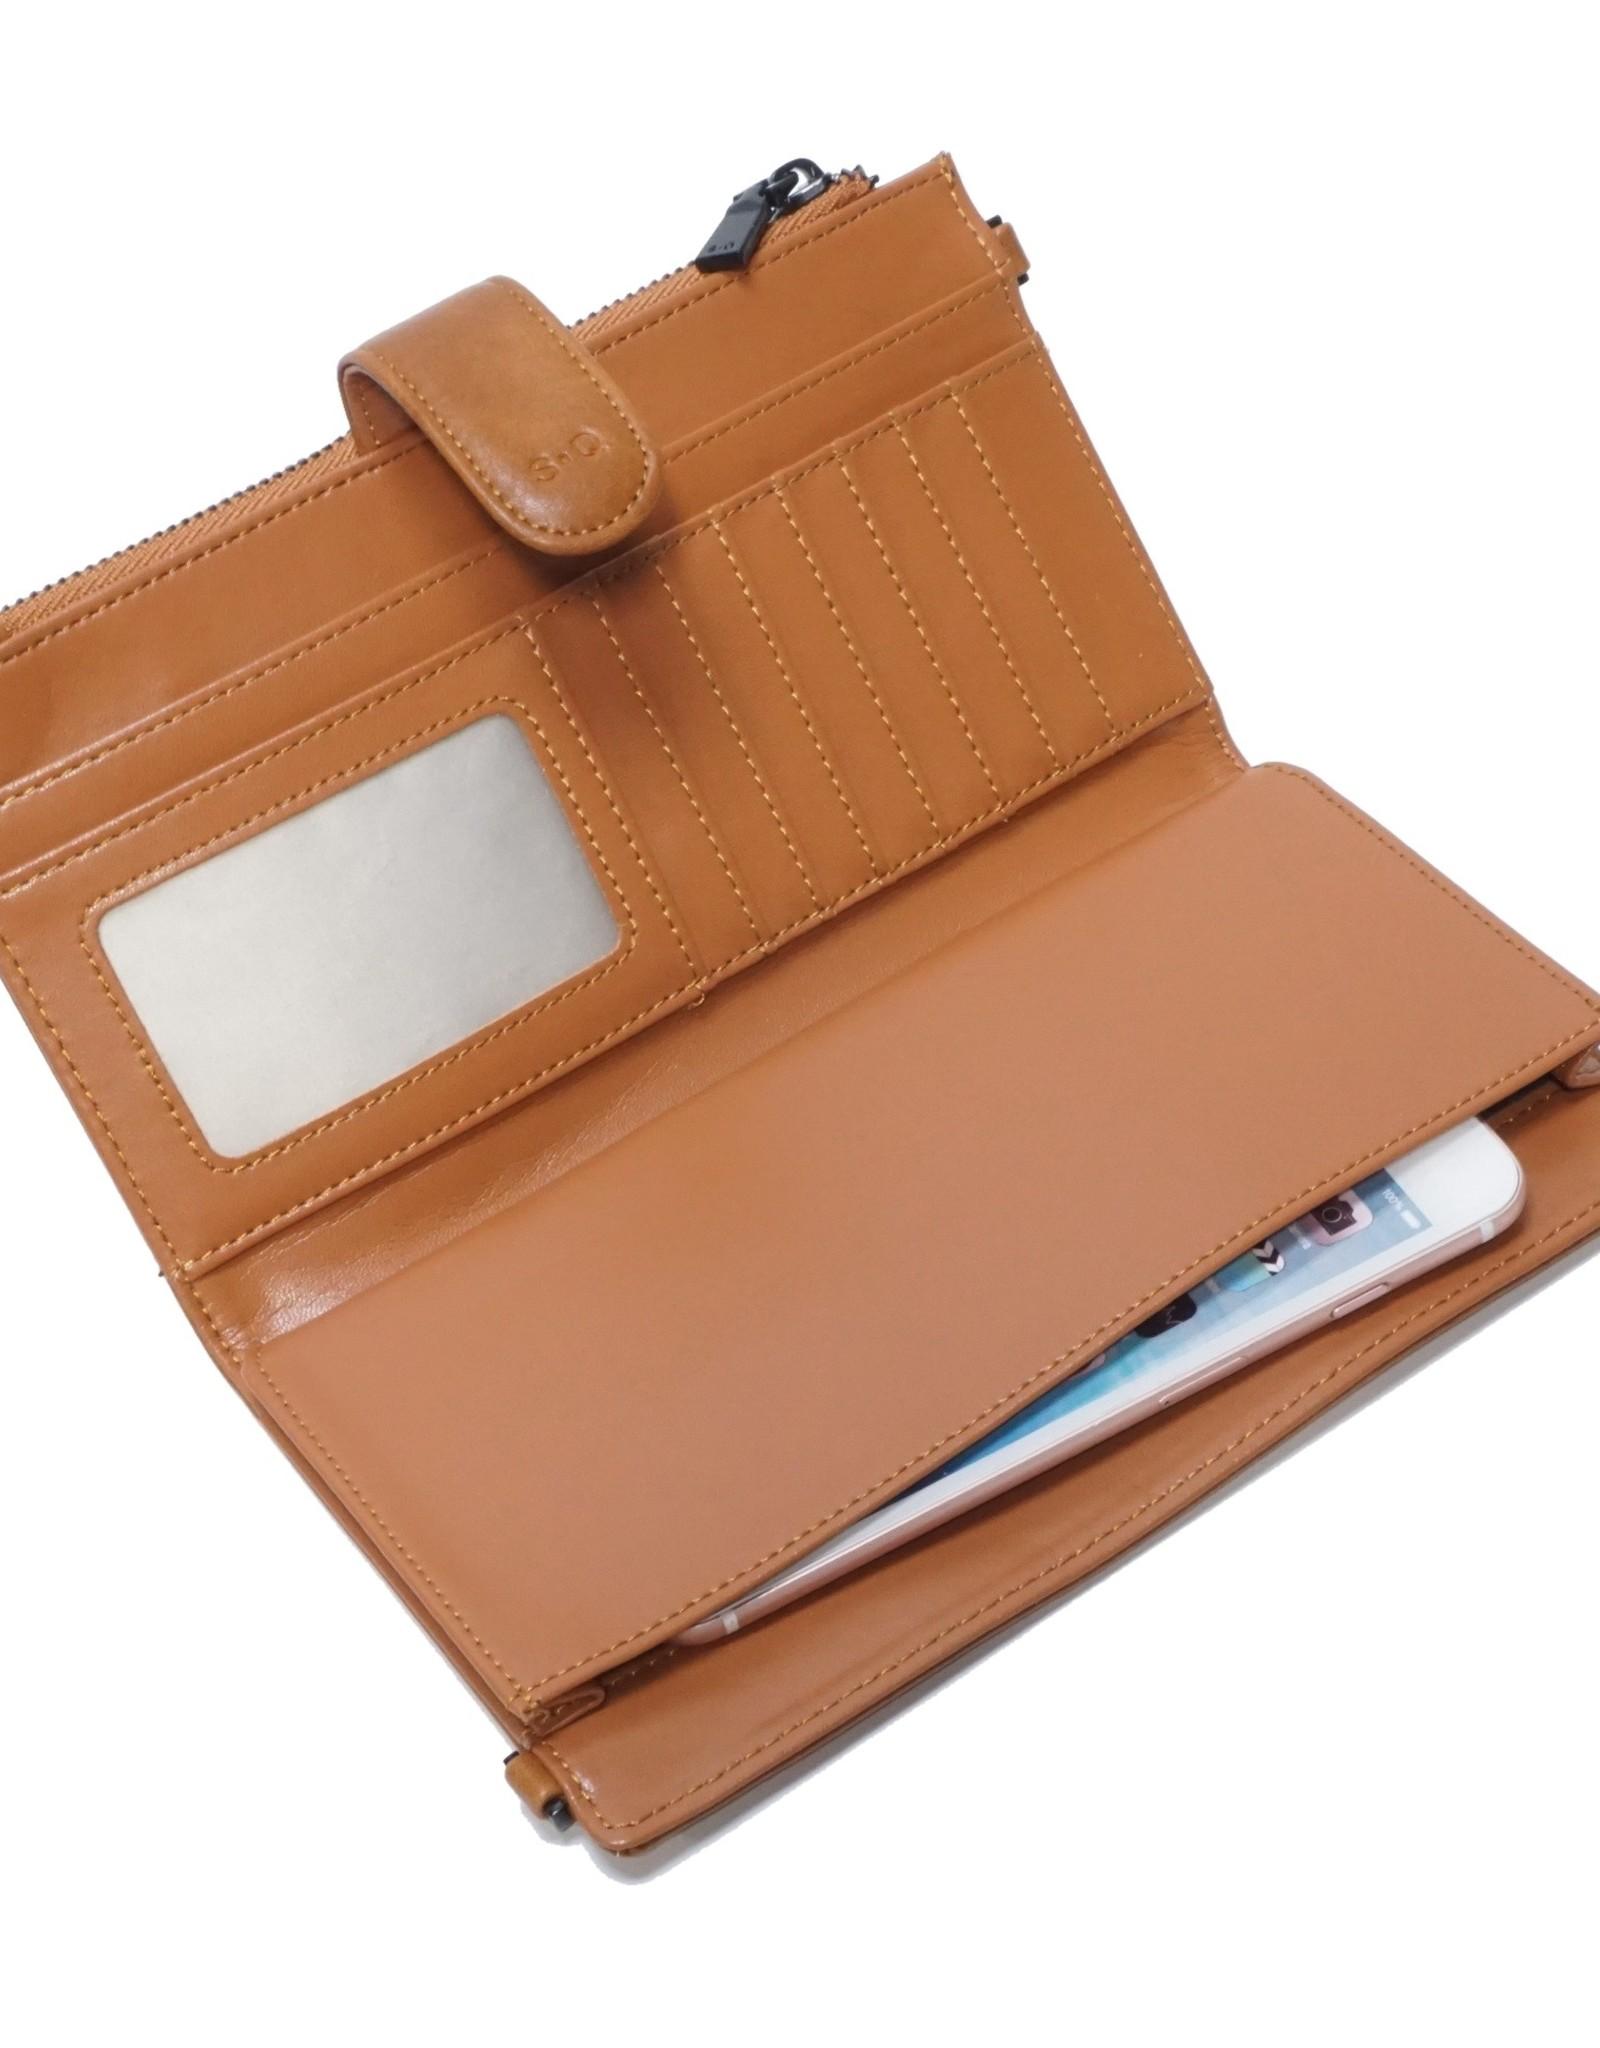 Harmony Smartphone Wallet-tan